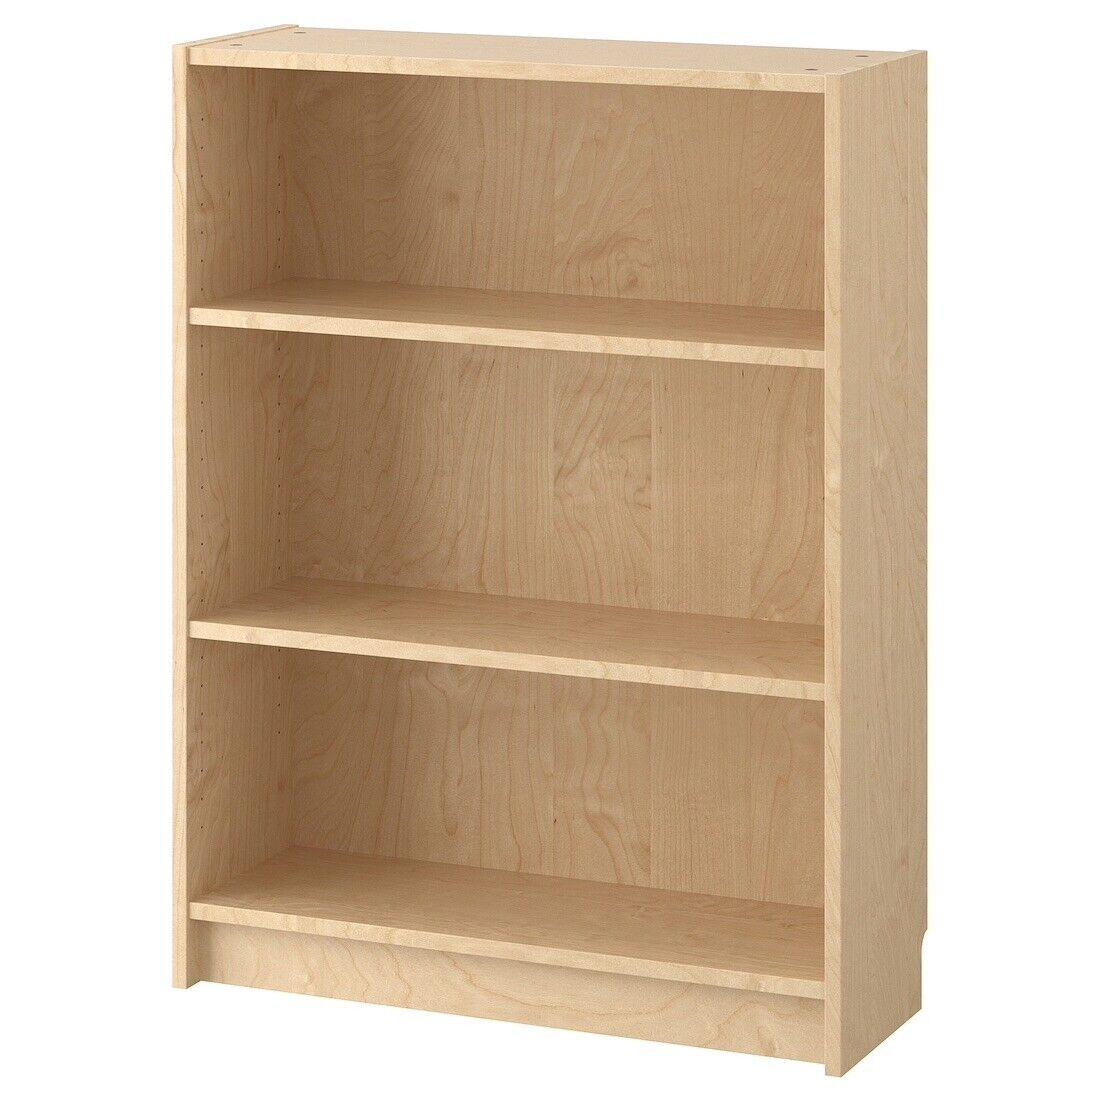 Ikea Billy Bookcase Birch Veneer 2 Shelves Included 802 797 86 New In Box